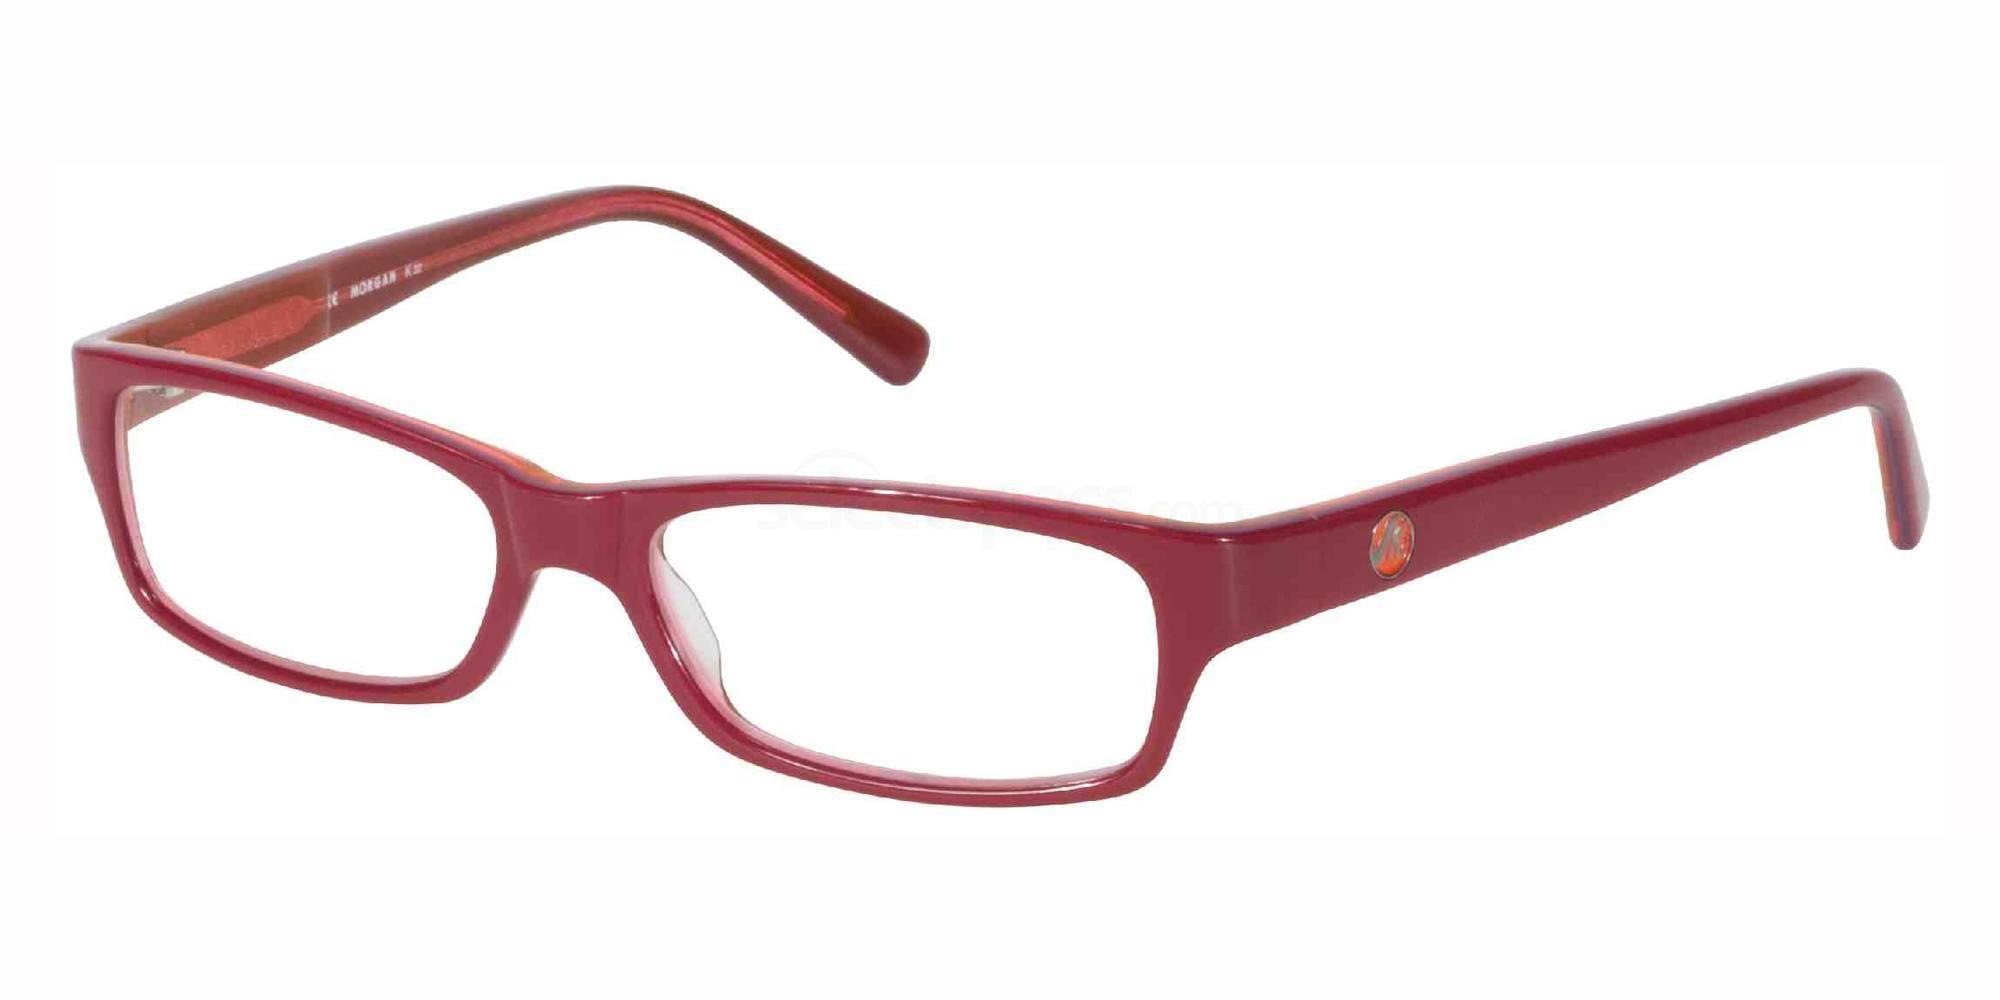 6329 201043 Glasses, MORGAN Eyewear